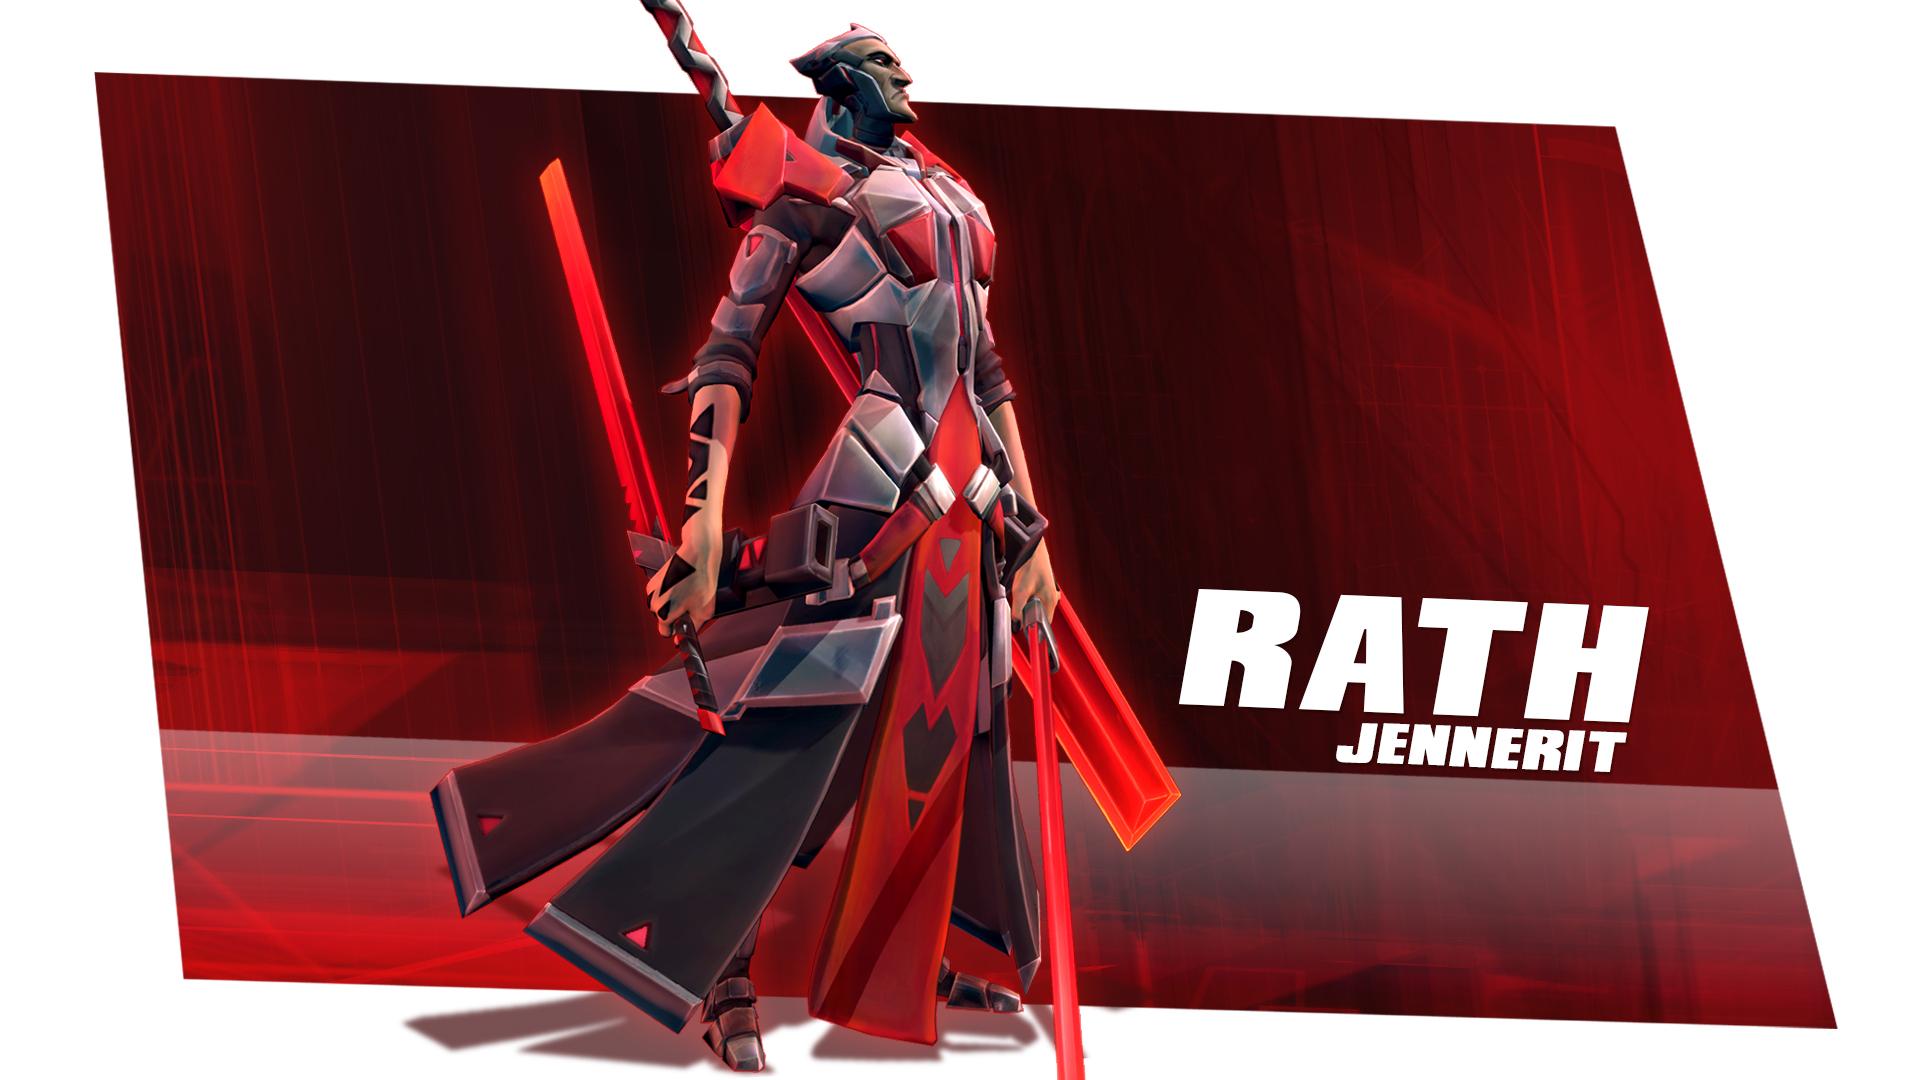 battleborn character rath